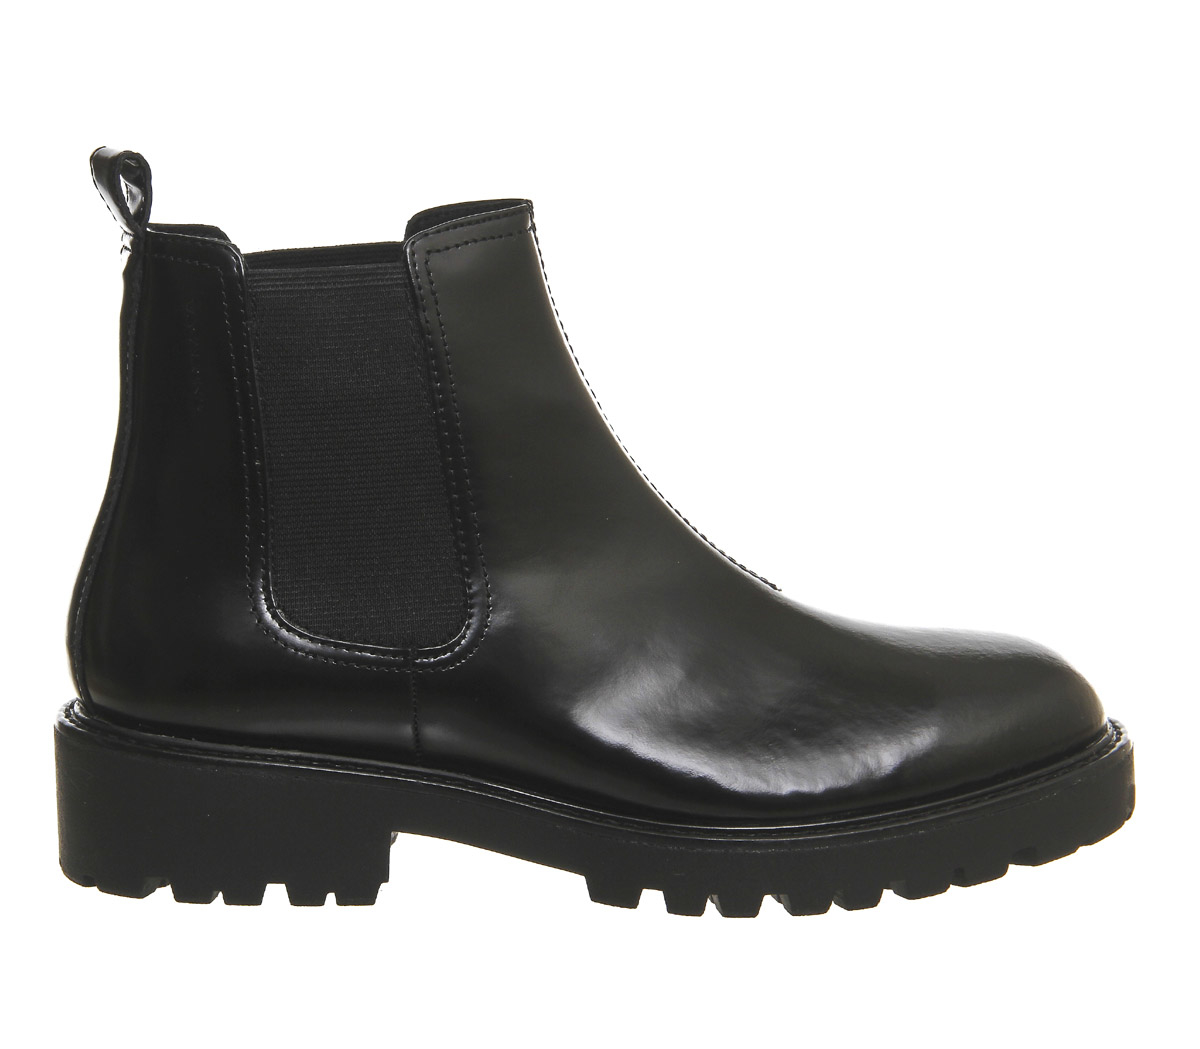 vagabond kenvova chelsea boots in black lyst. Black Bedroom Furniture Sets. Home Design Ideas